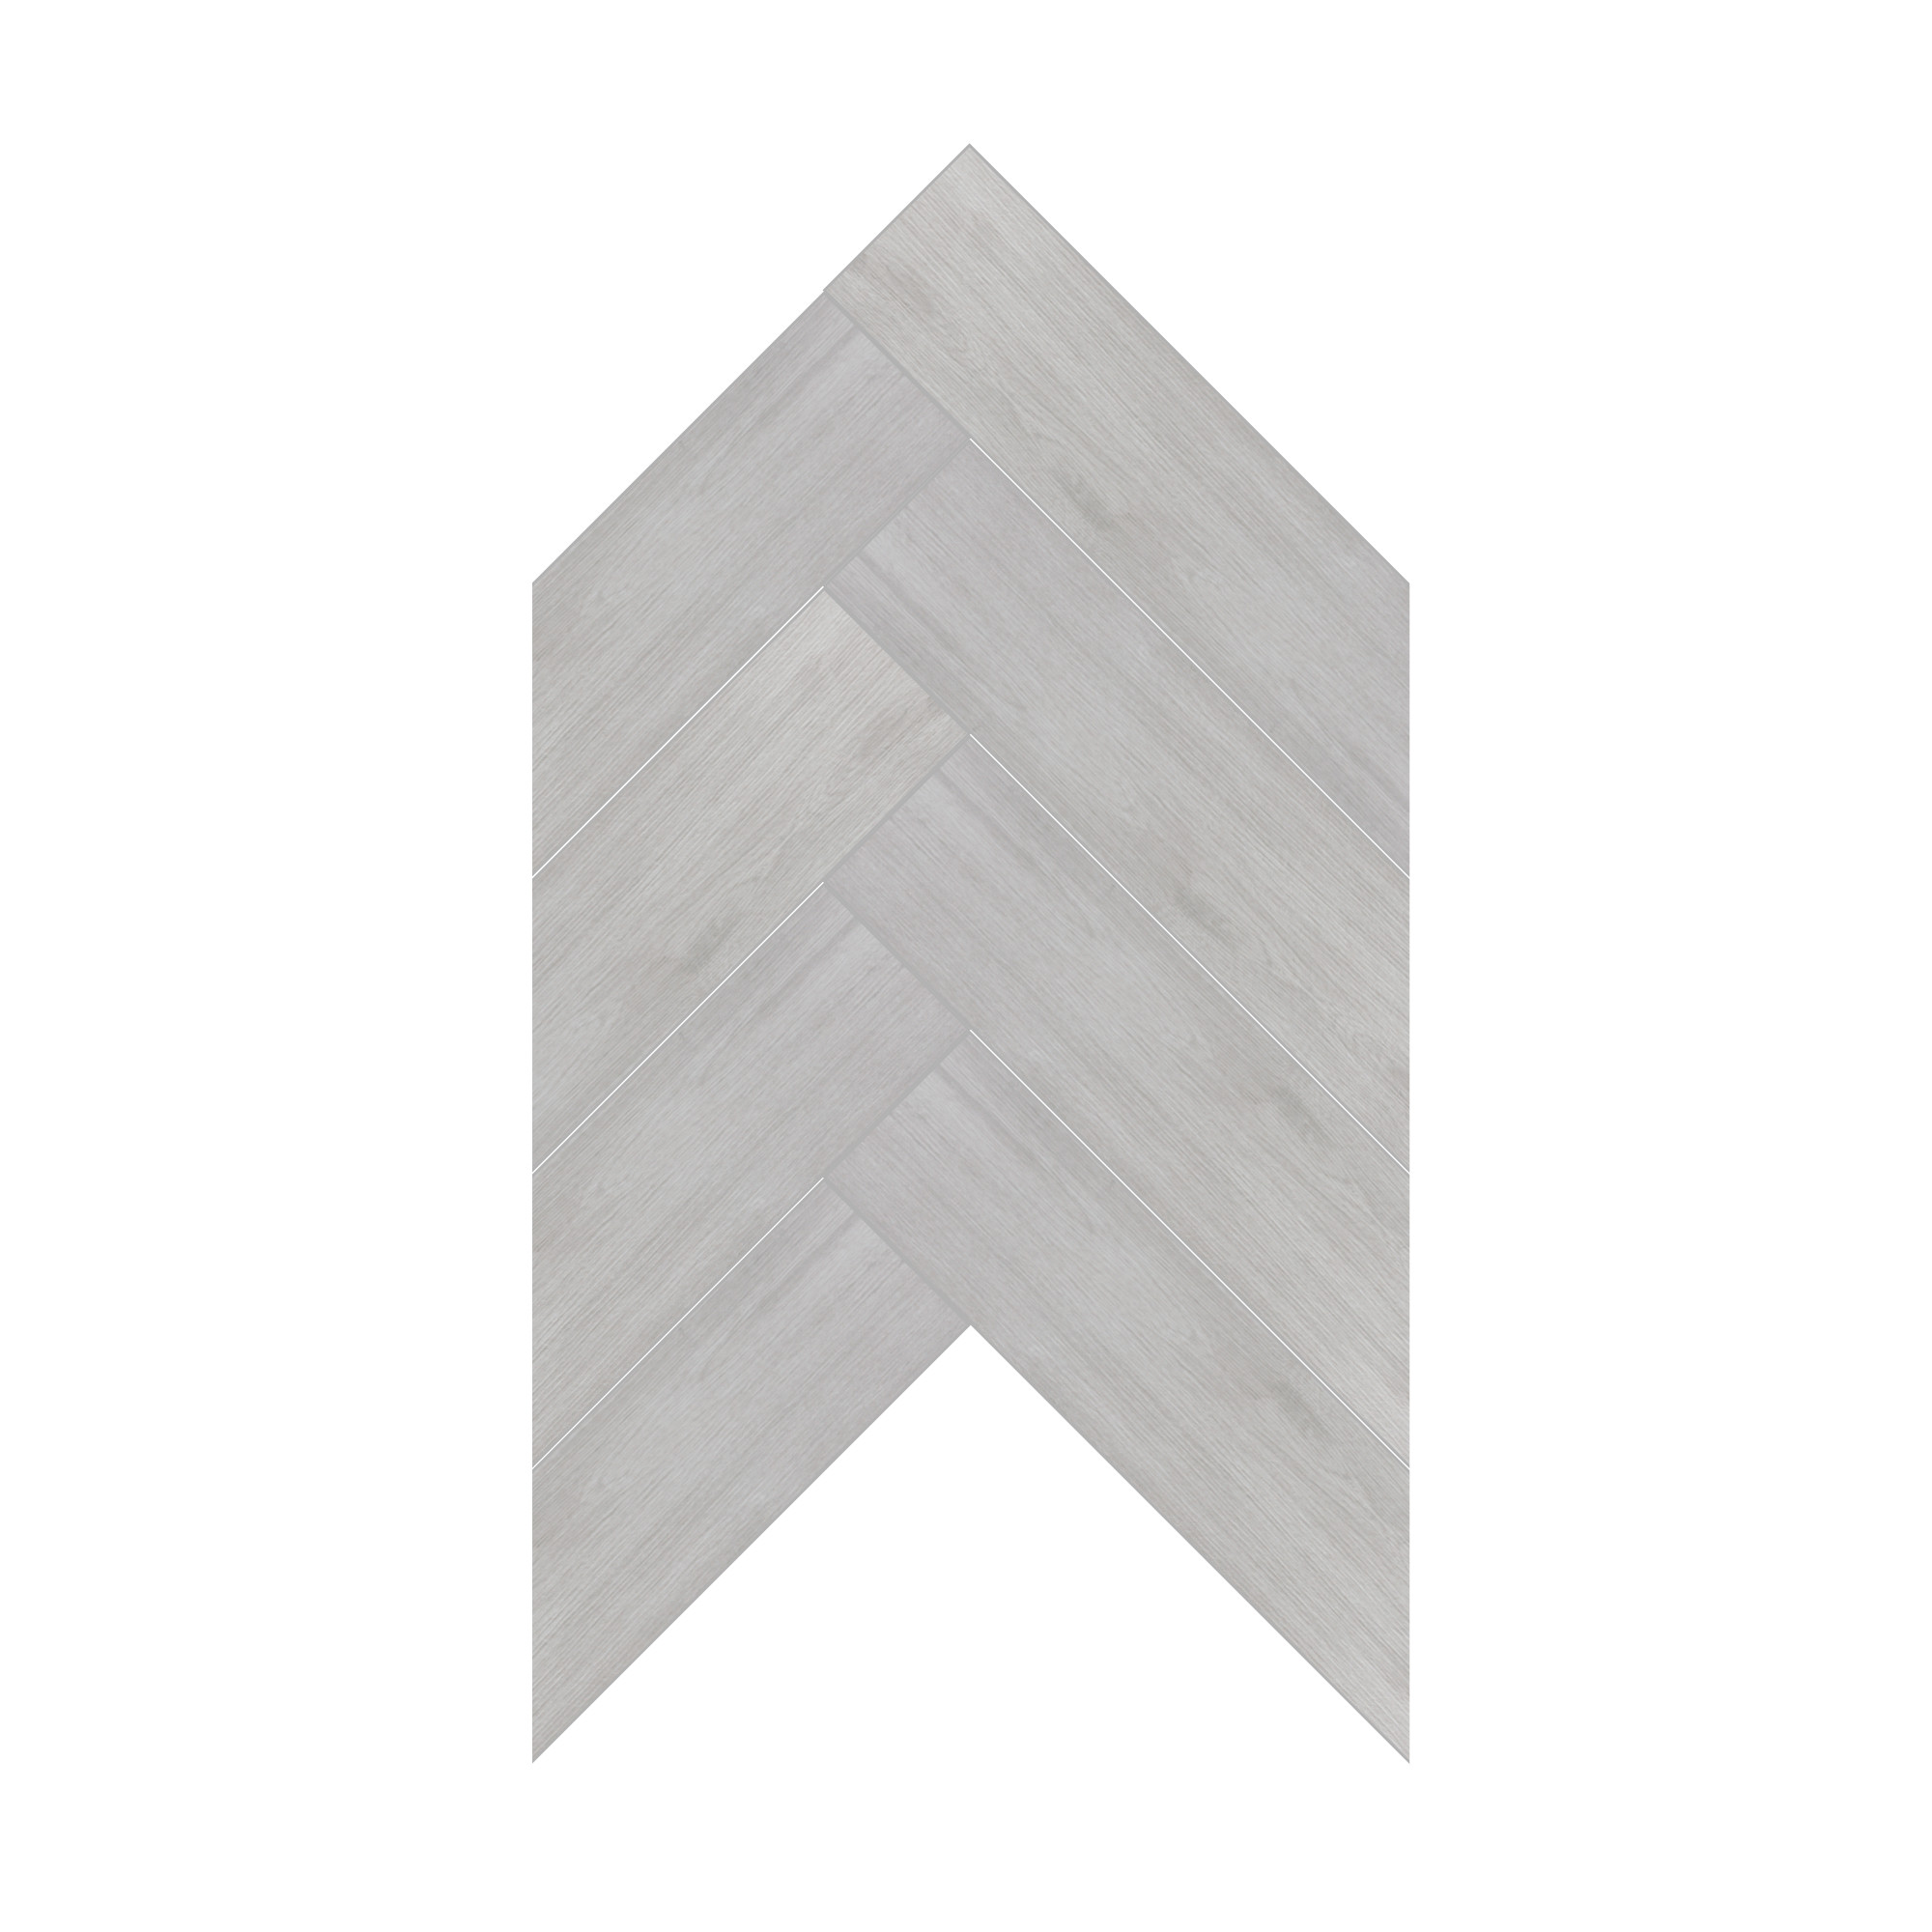 Carrelage sol et mur aspect parquet blanchi Walkyria White 20x120 cm